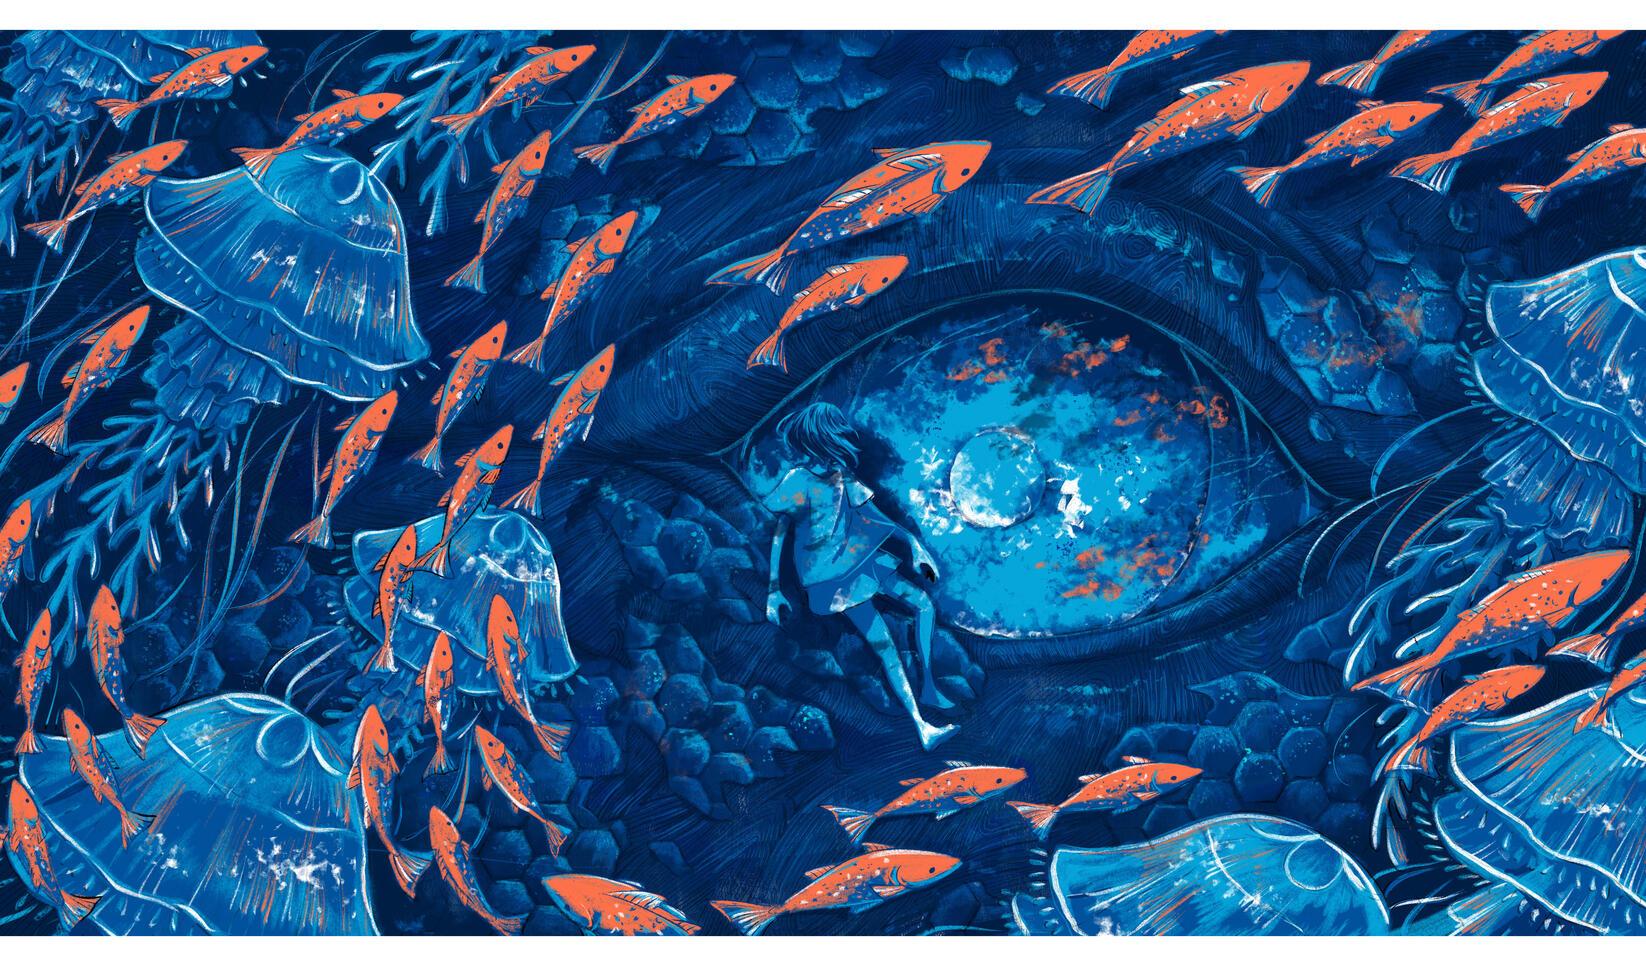 Playground illustration by Eri Iguchi ; Eri Iguchi